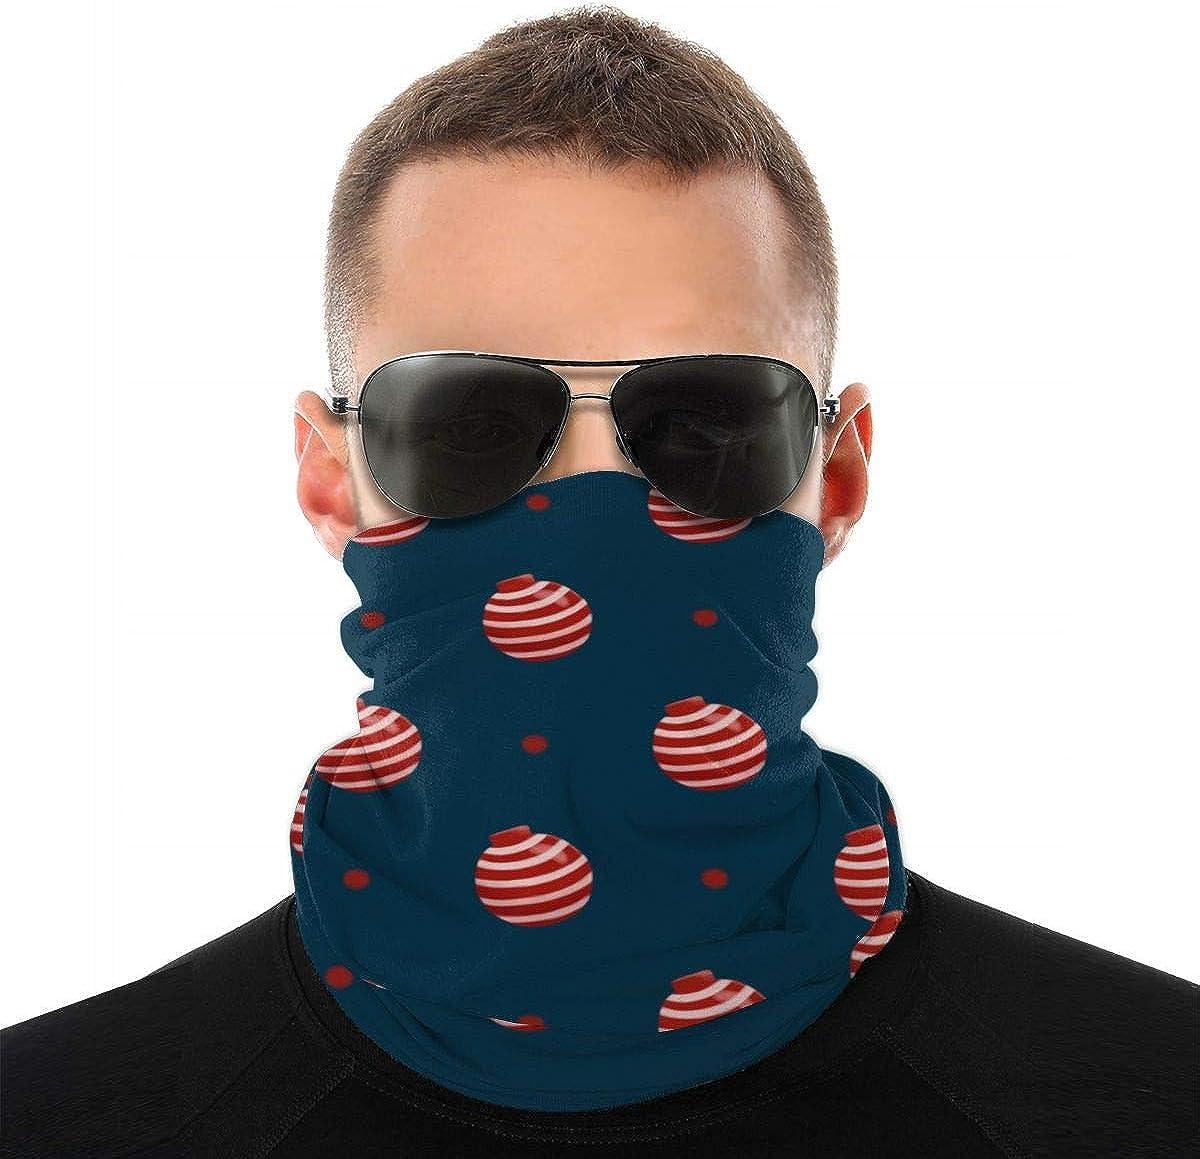 Daily Bandana Headband Set Cream Ice Cream Printing Sport Sun Protection Windproof Dust Face Scarf Headdress